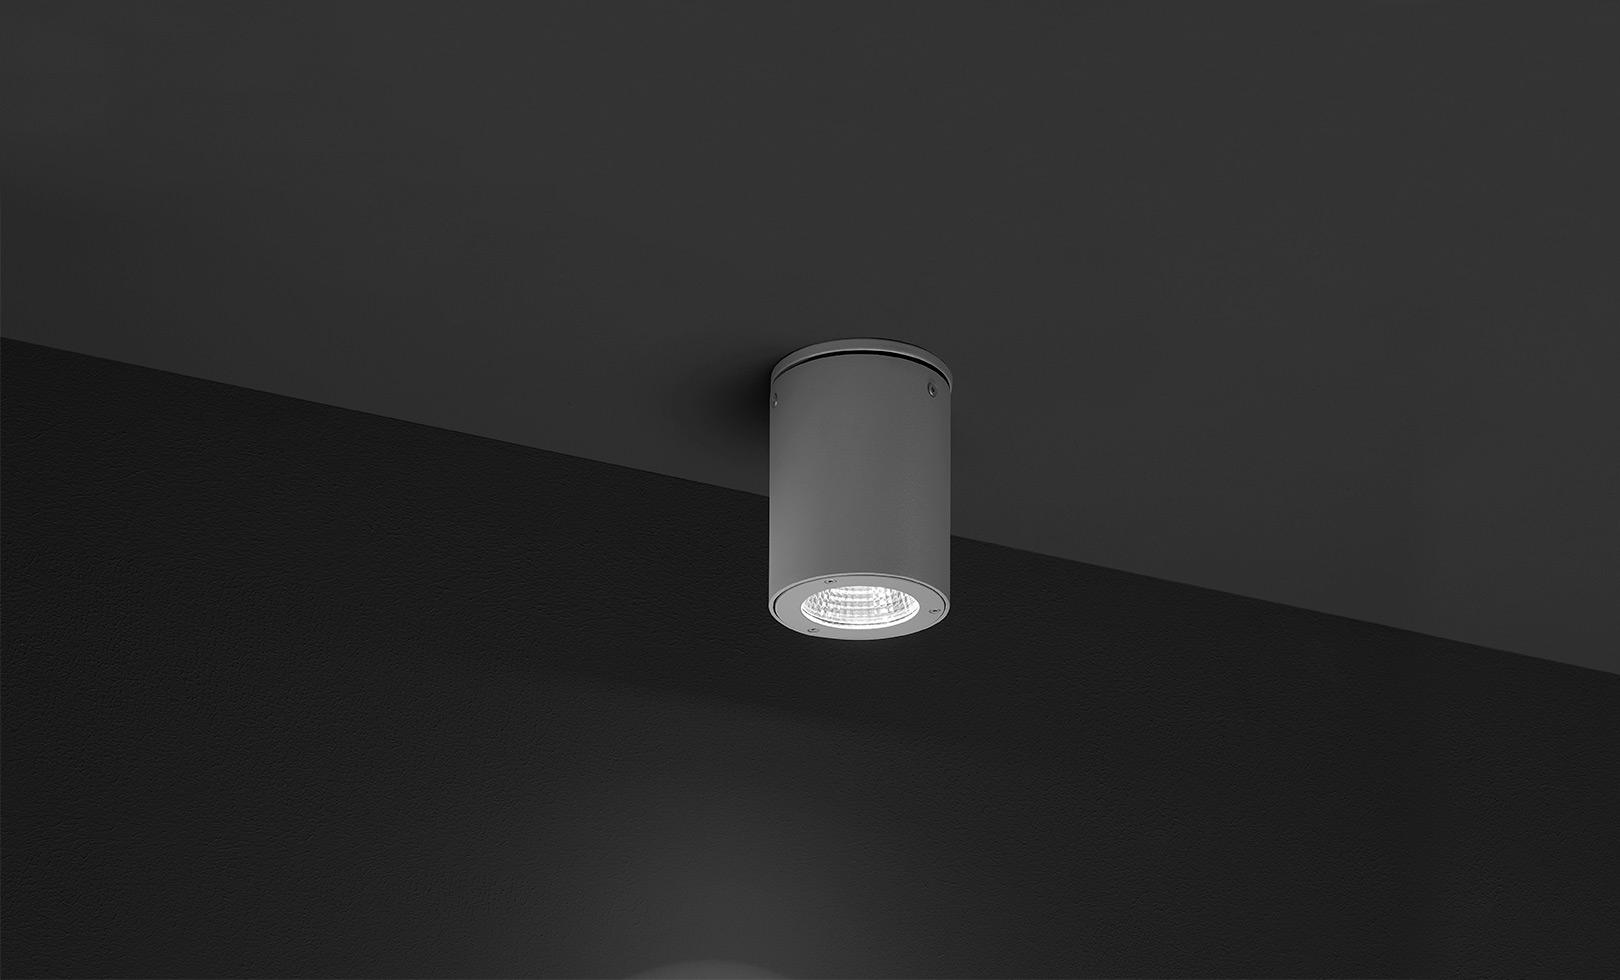 706008 TECH MINI COMPACT 03 ROUND LED 9W 1